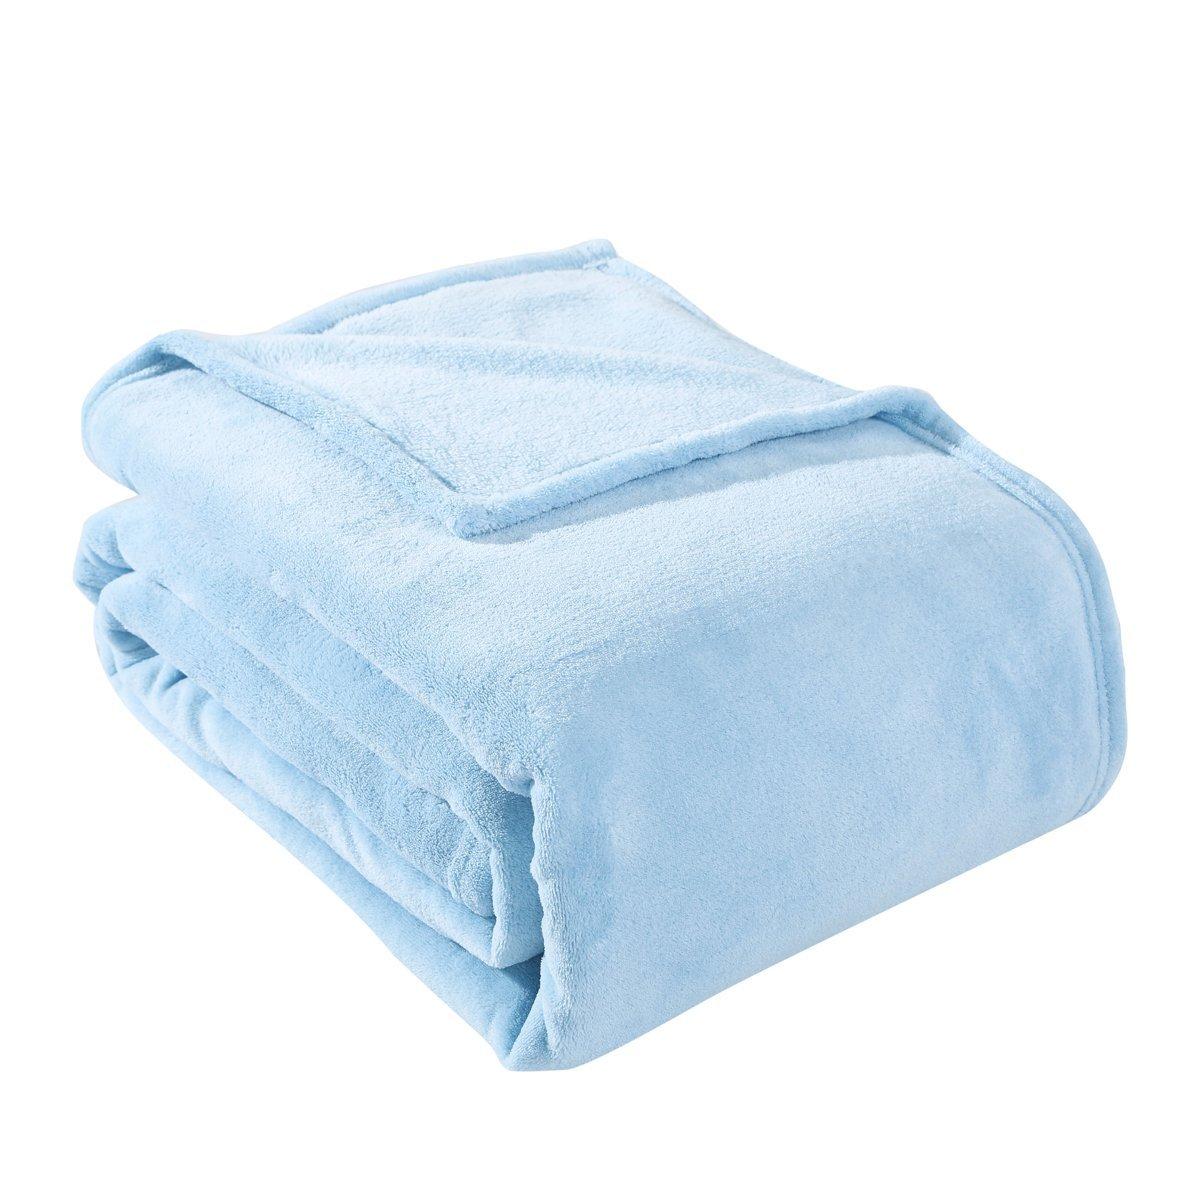 Big Discount On The Best Queen Pillow Blanket Amp King Bed